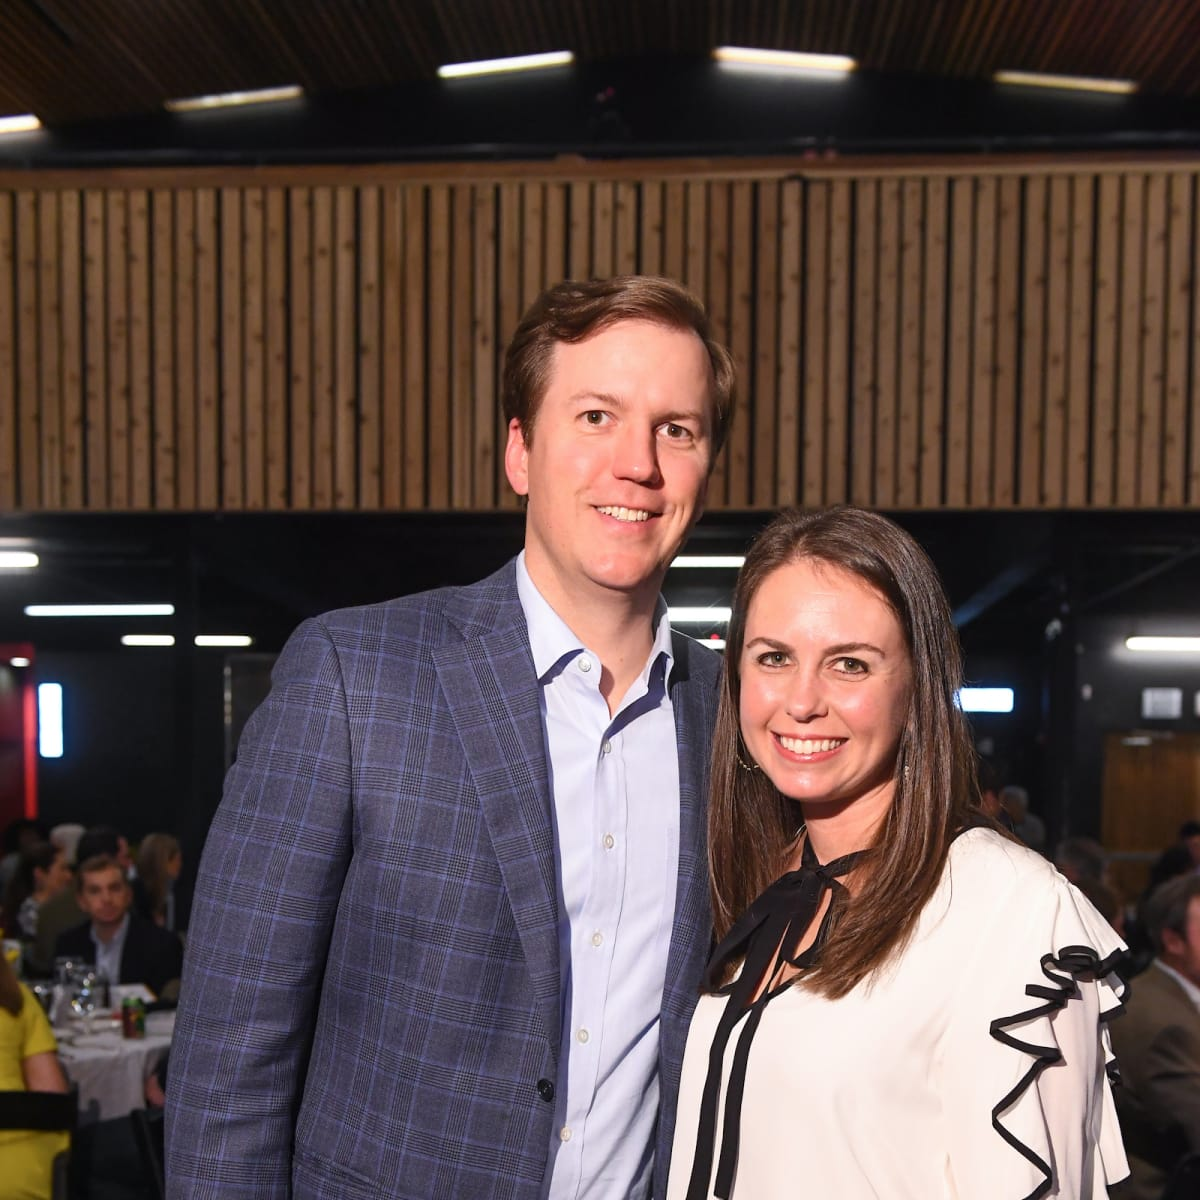 Jenni and Nick Swyka